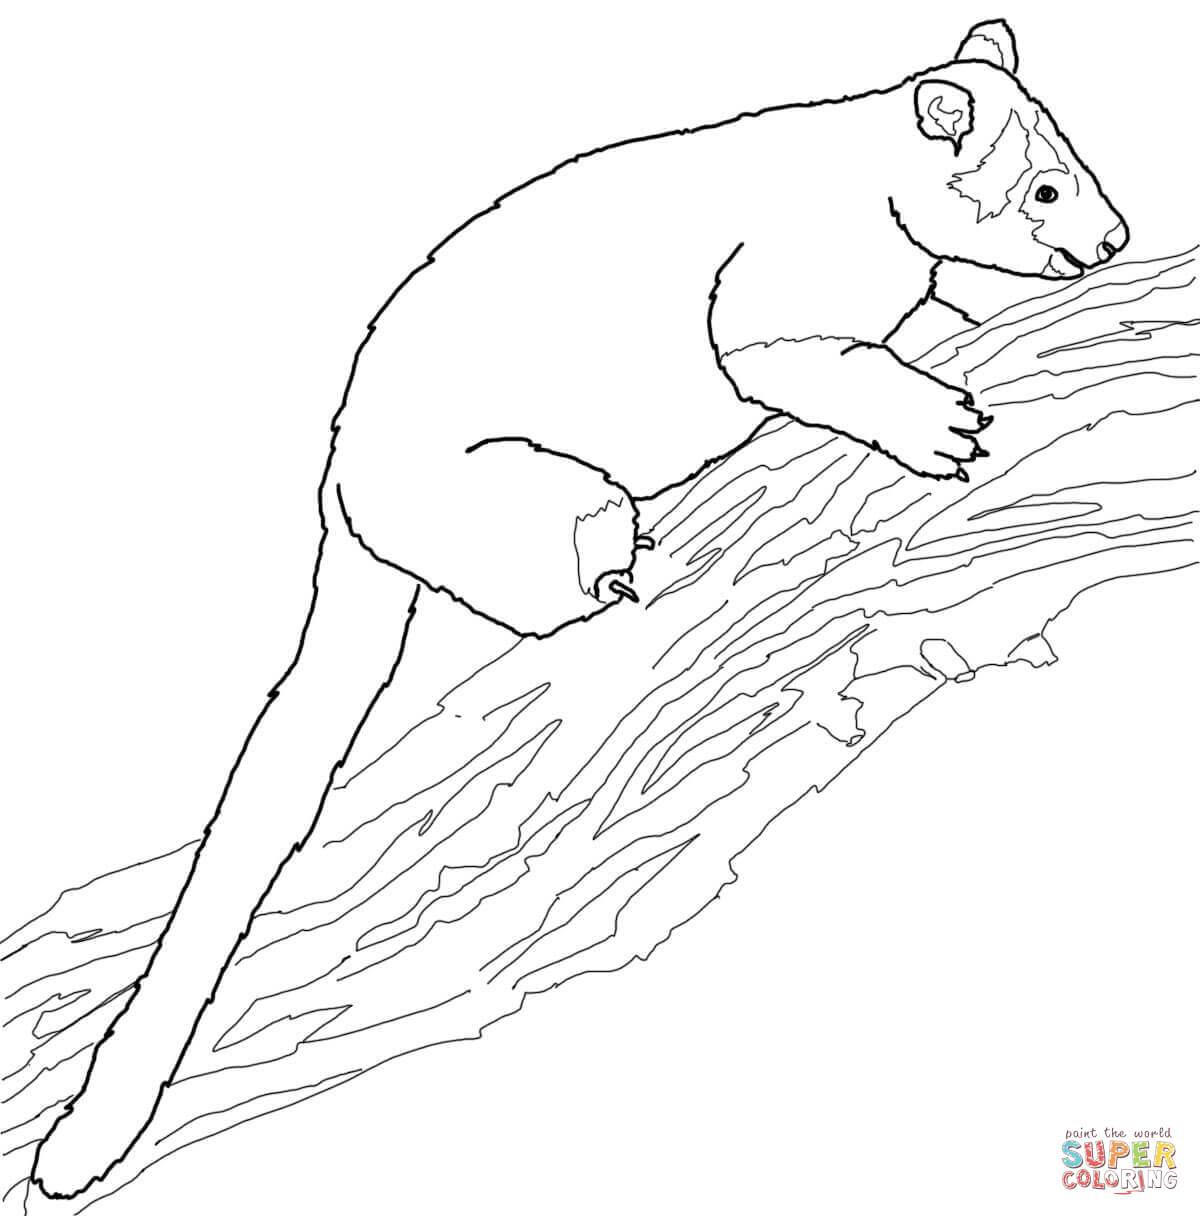 1200x1216 Tree Kangaroo Coloring Page Free Printable Pages